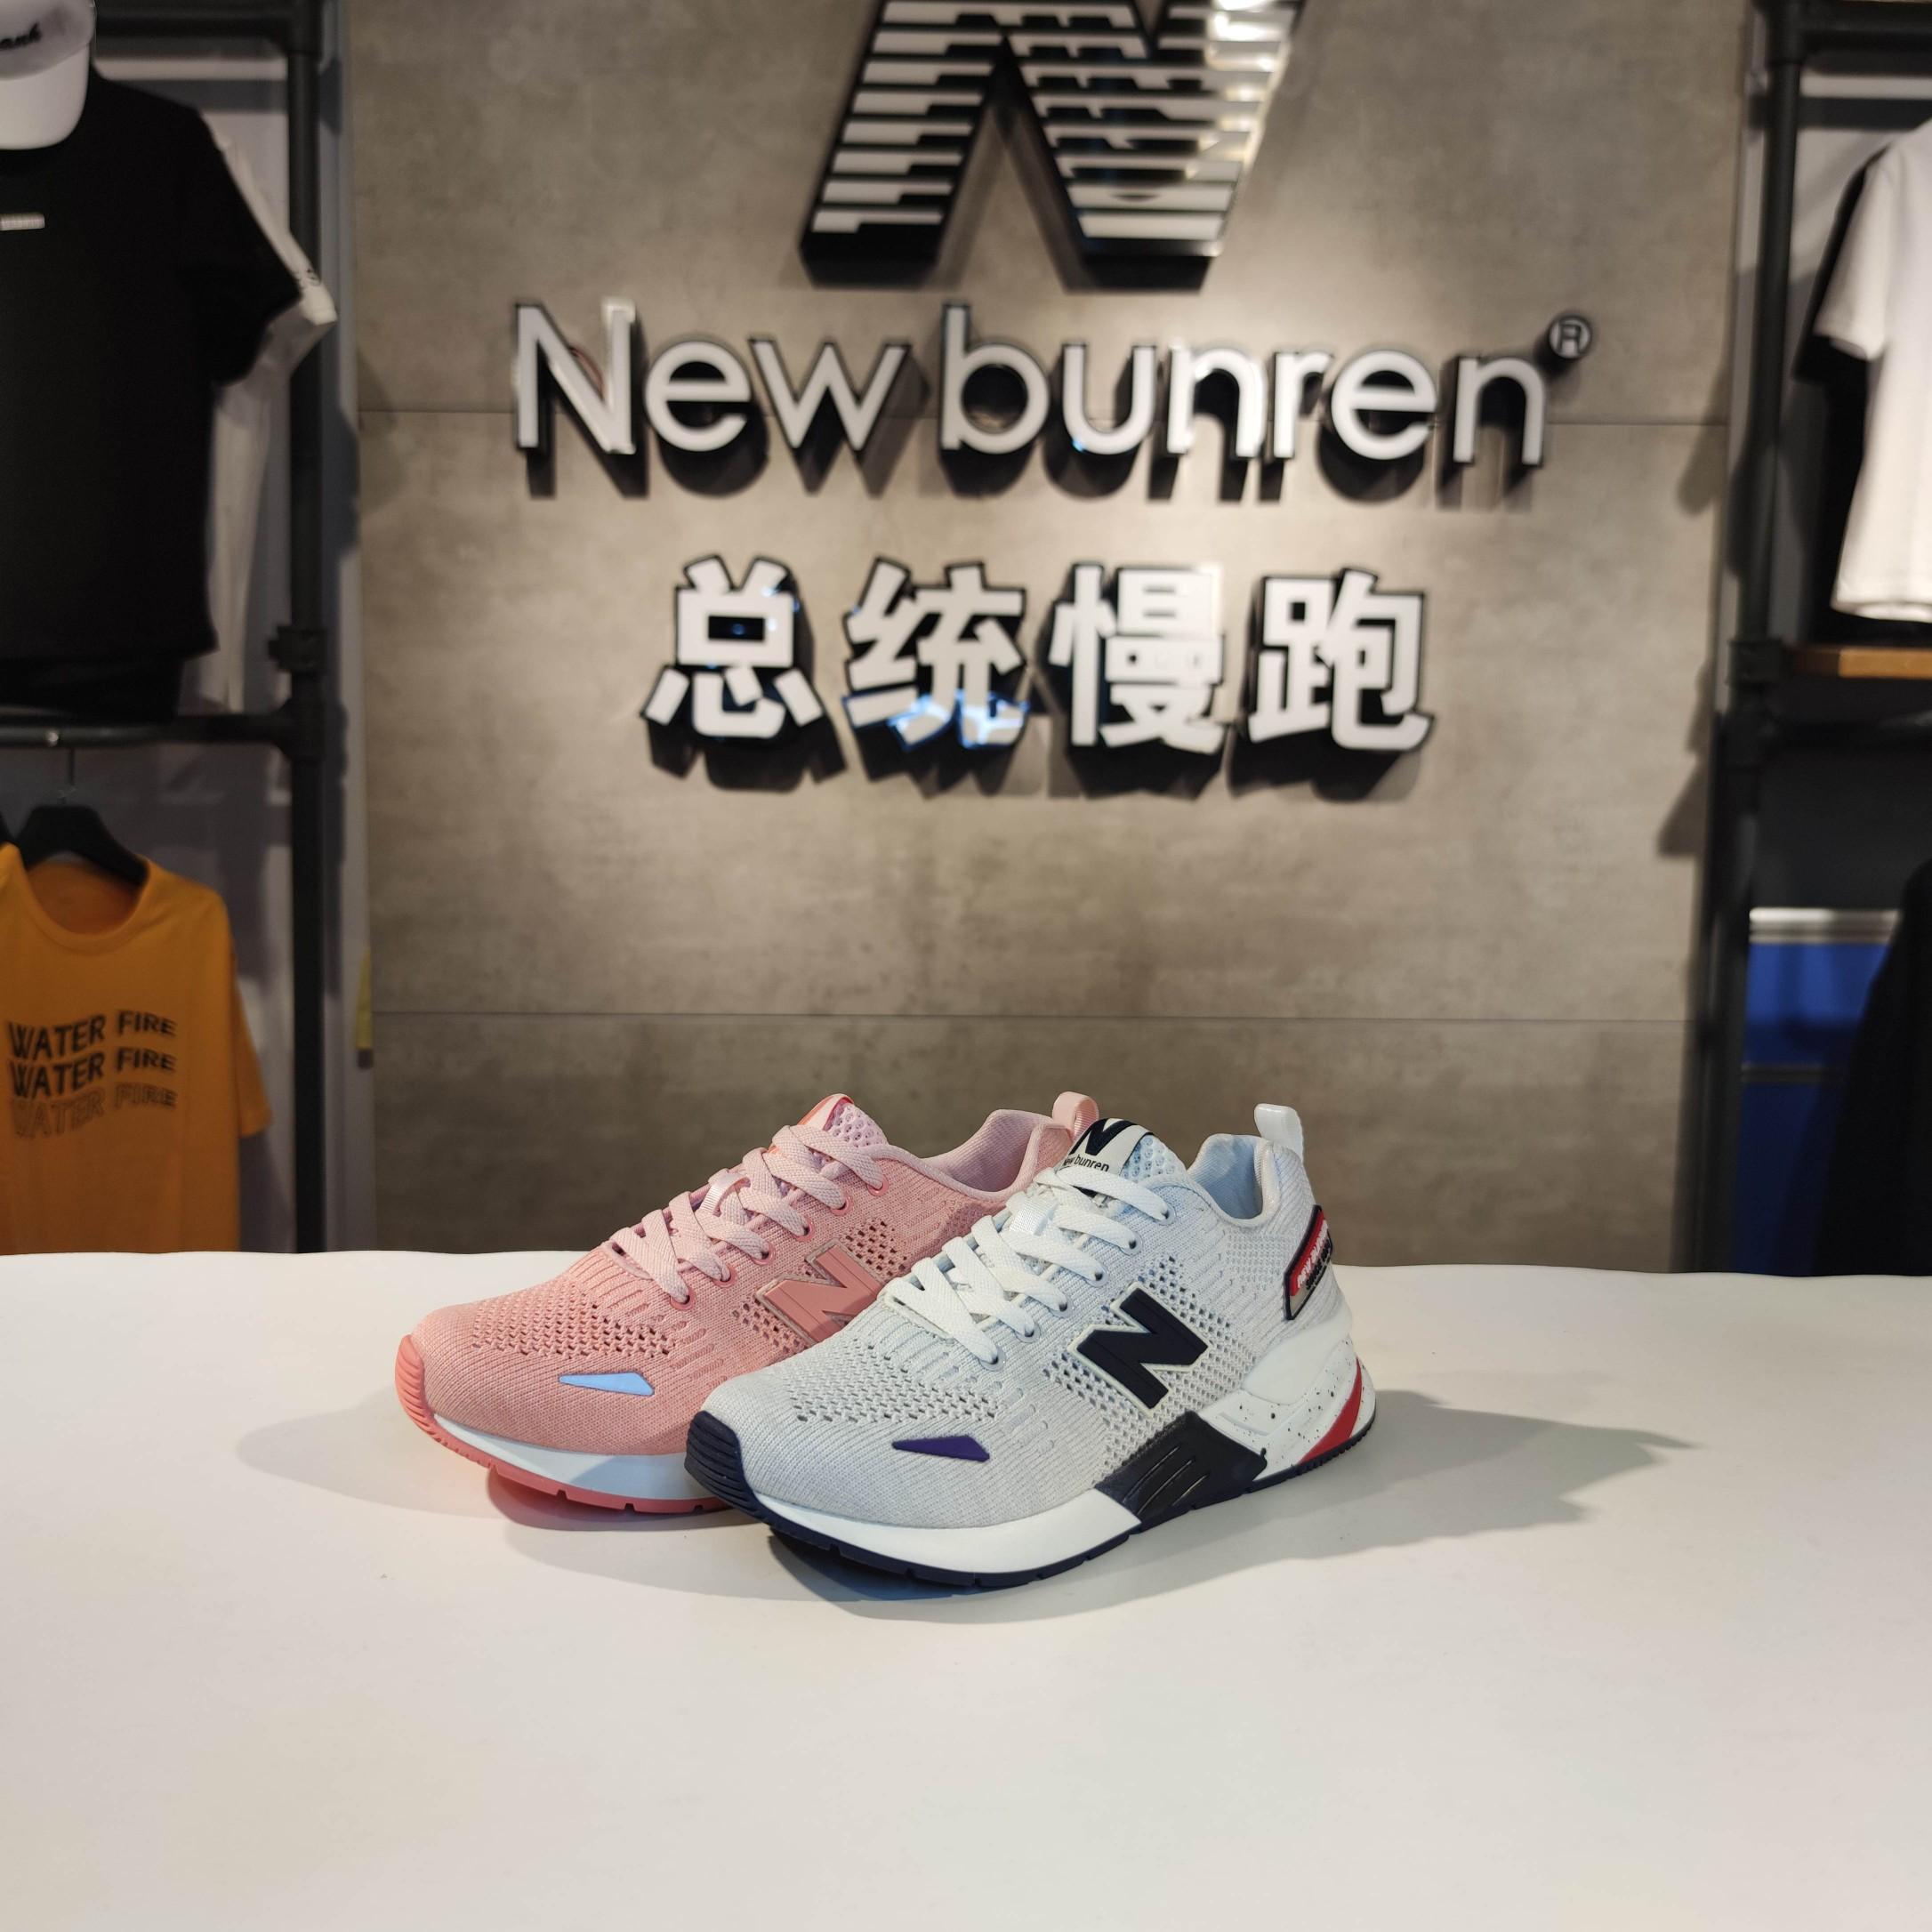 New bunren总统慢跑鞋2020新款情侣版超薄透气时尚百搭运动跑步鞋